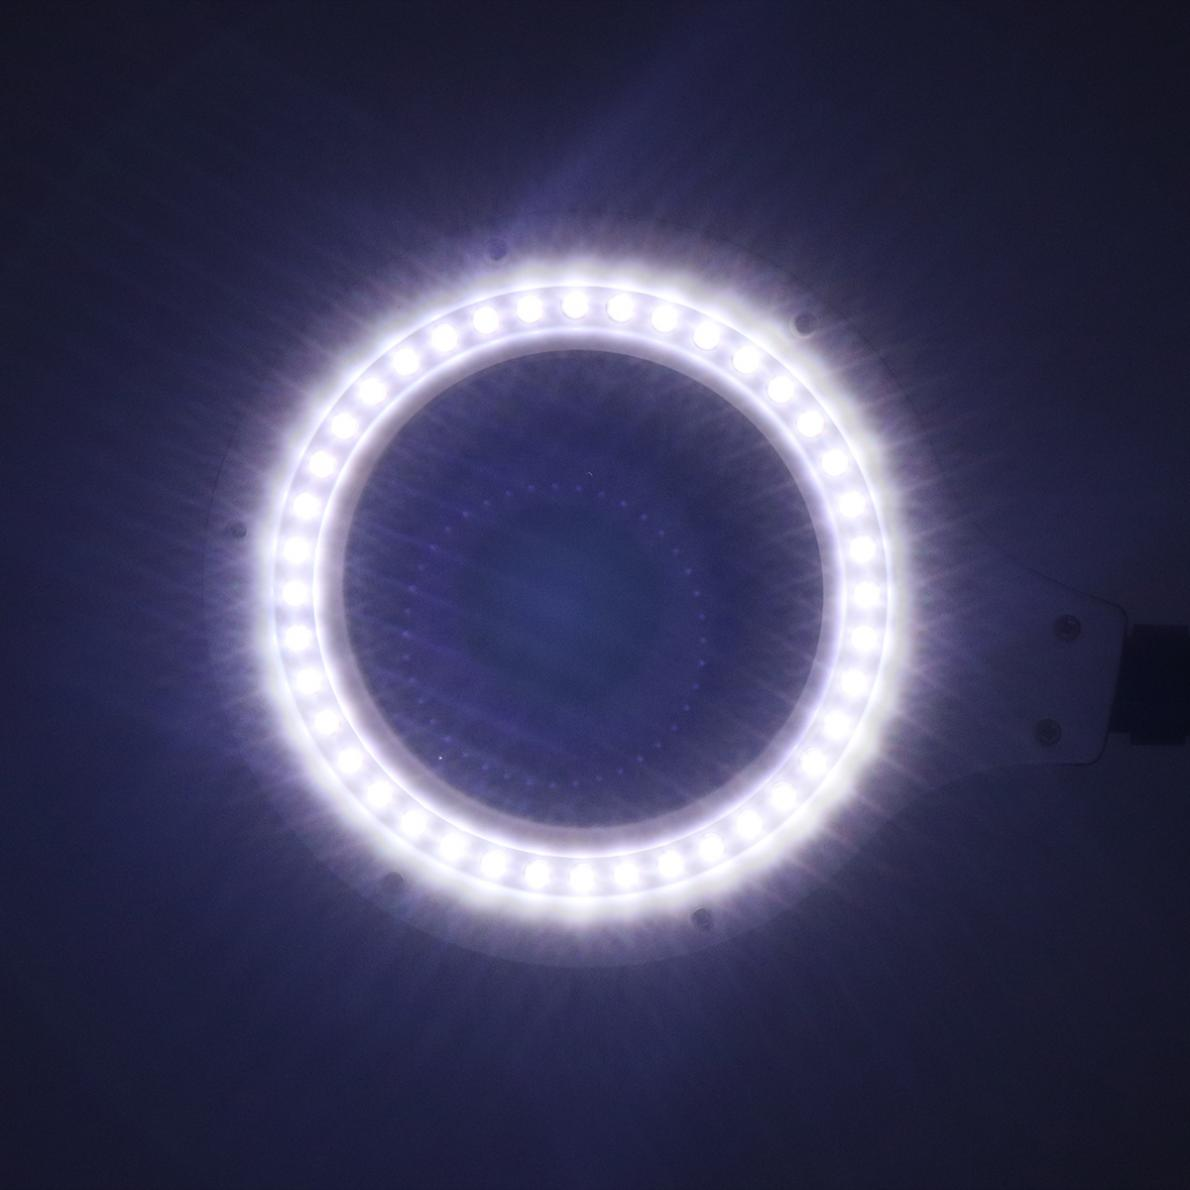 110V 220V 18W Magnifying Light Brightness Desk Lamp with 5X 10X and 40 LED Lighting for Reading Table Lights in Desk Lamps from Lights Lighting